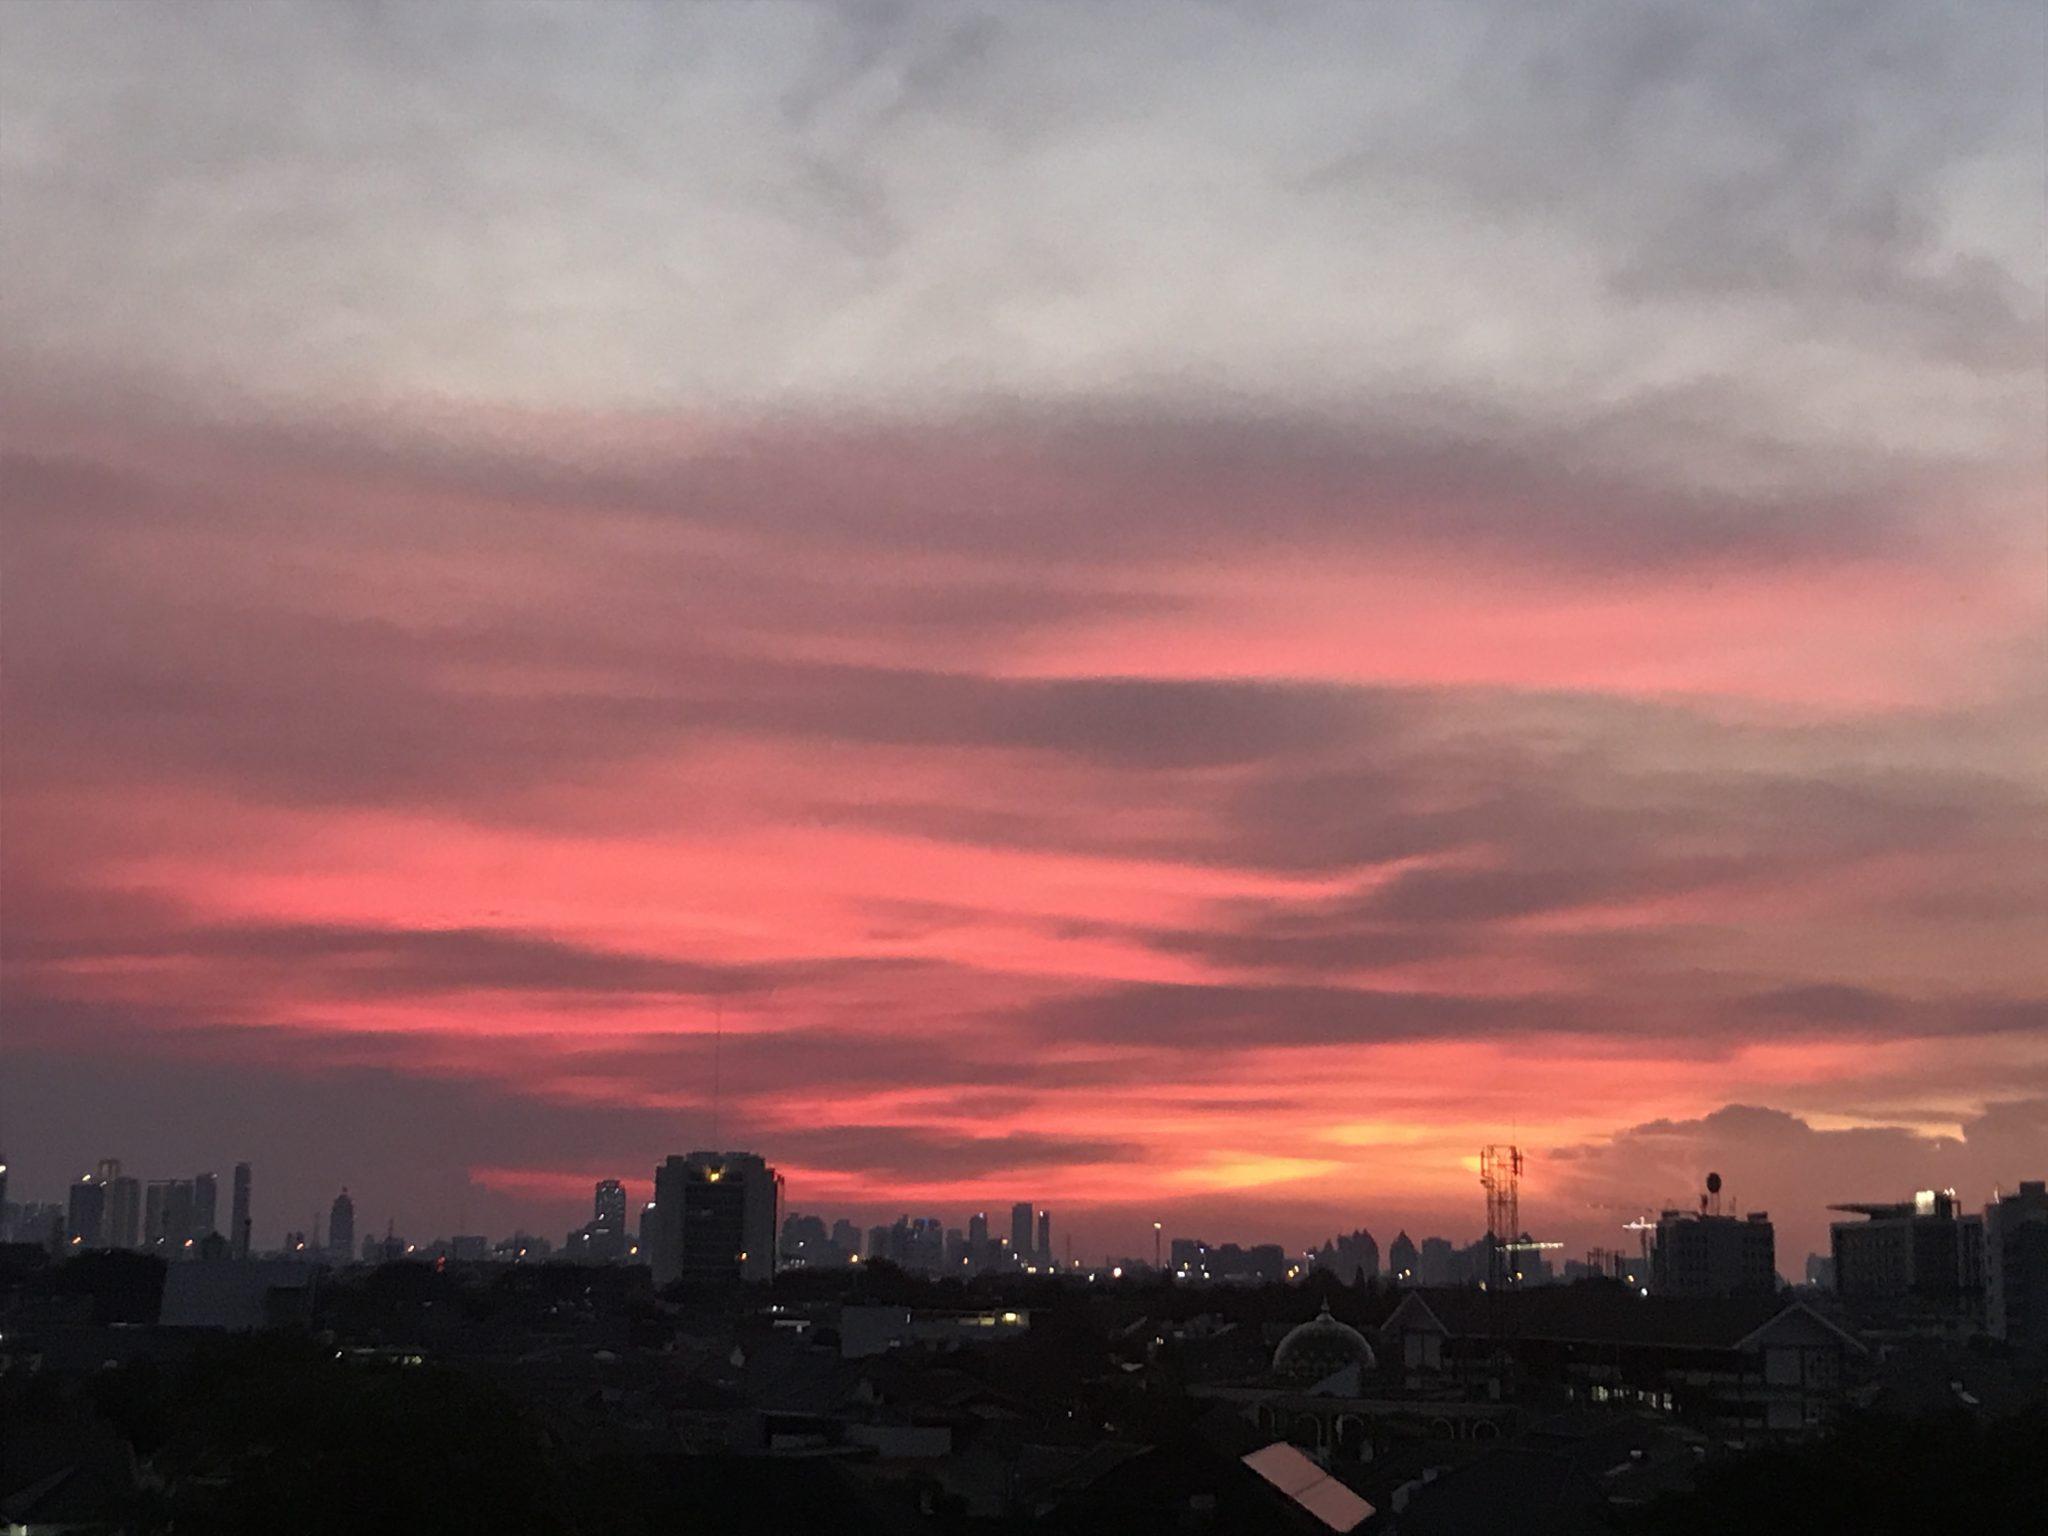 Jakarta Sunset Skyline Photograph by Sonal Sadarangani